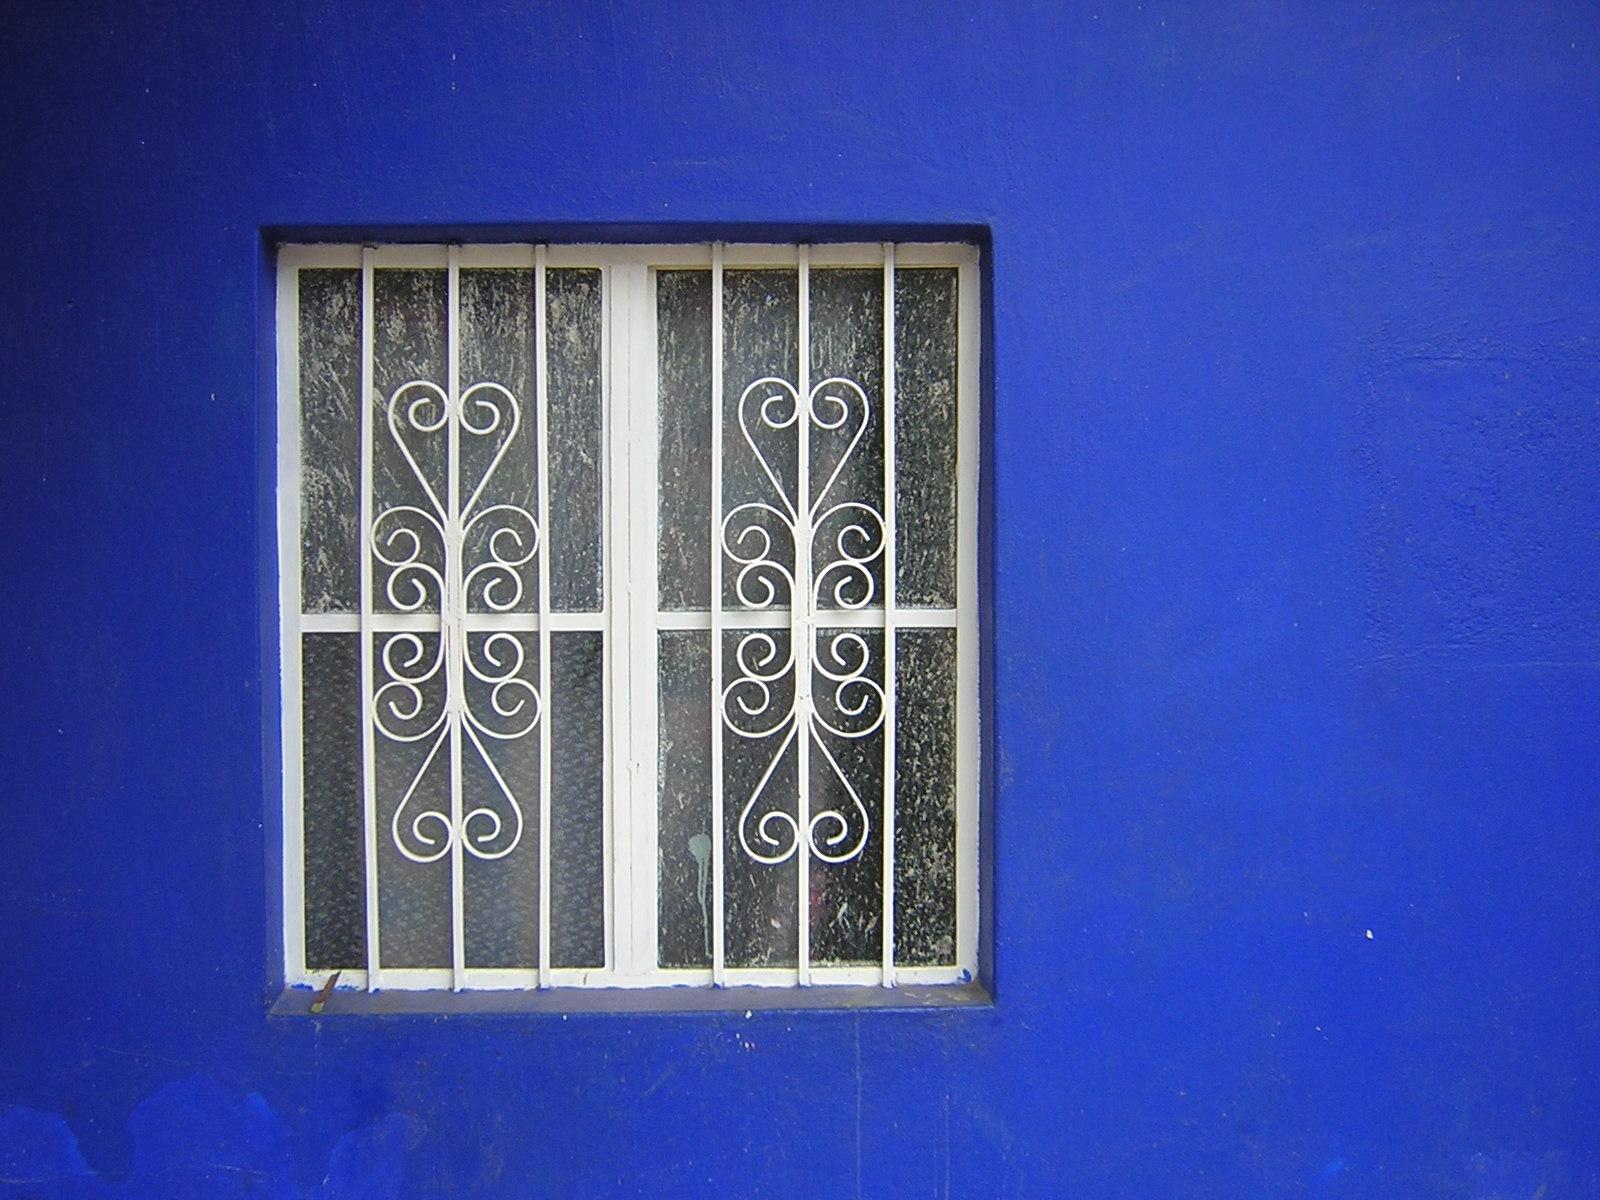 Mexico window 2004.jpg